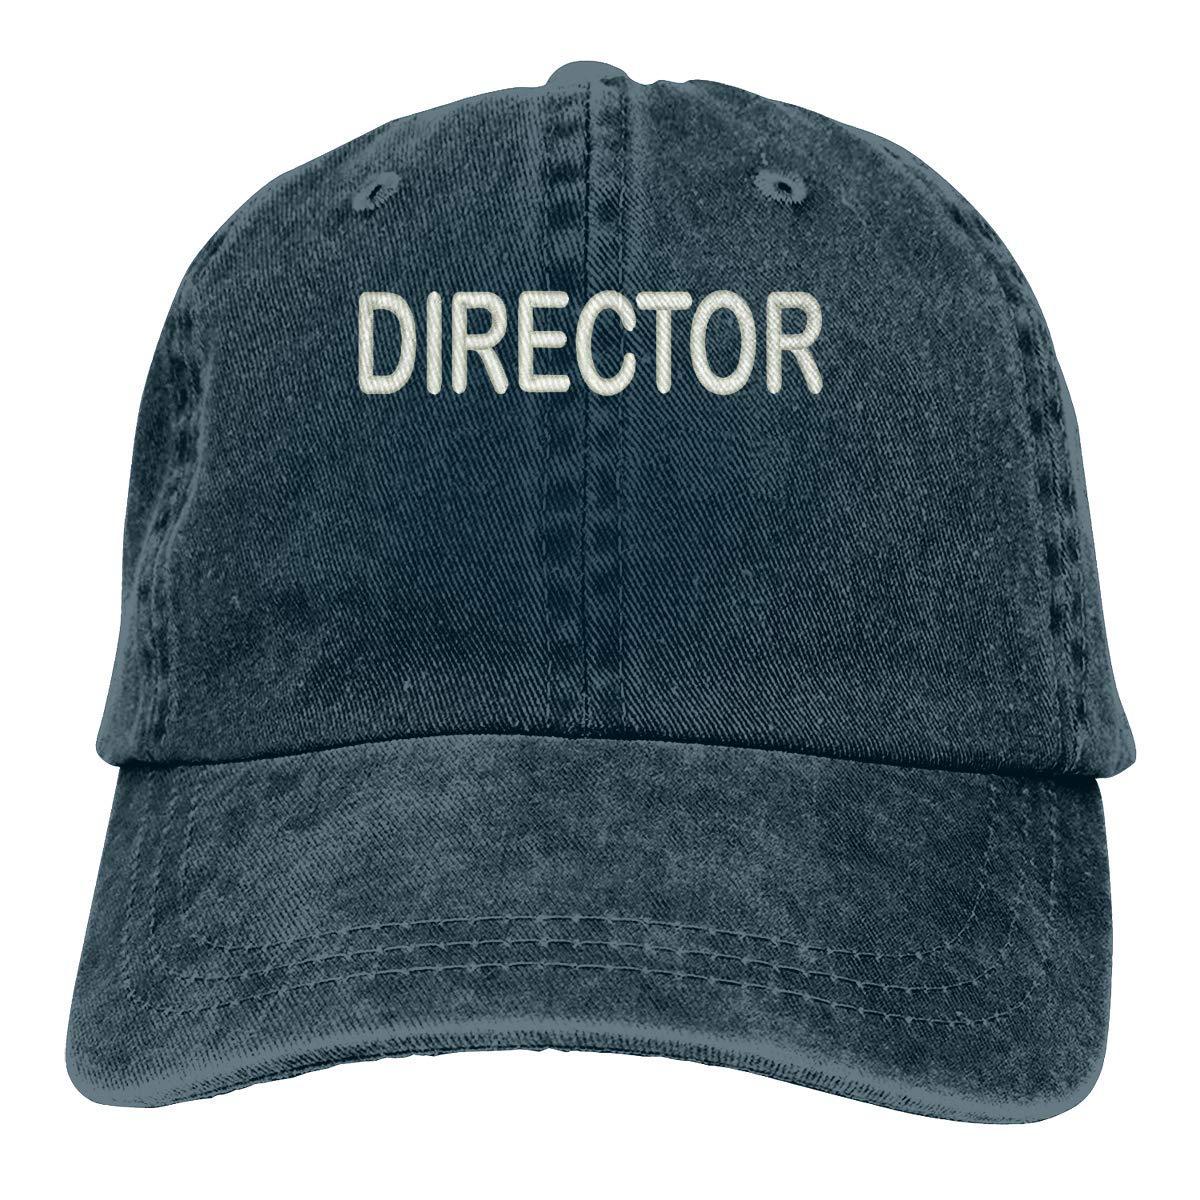 Director Black wwoman Unisex Adults Vintage Washed Baseball Cap Adjustable Dad Hat